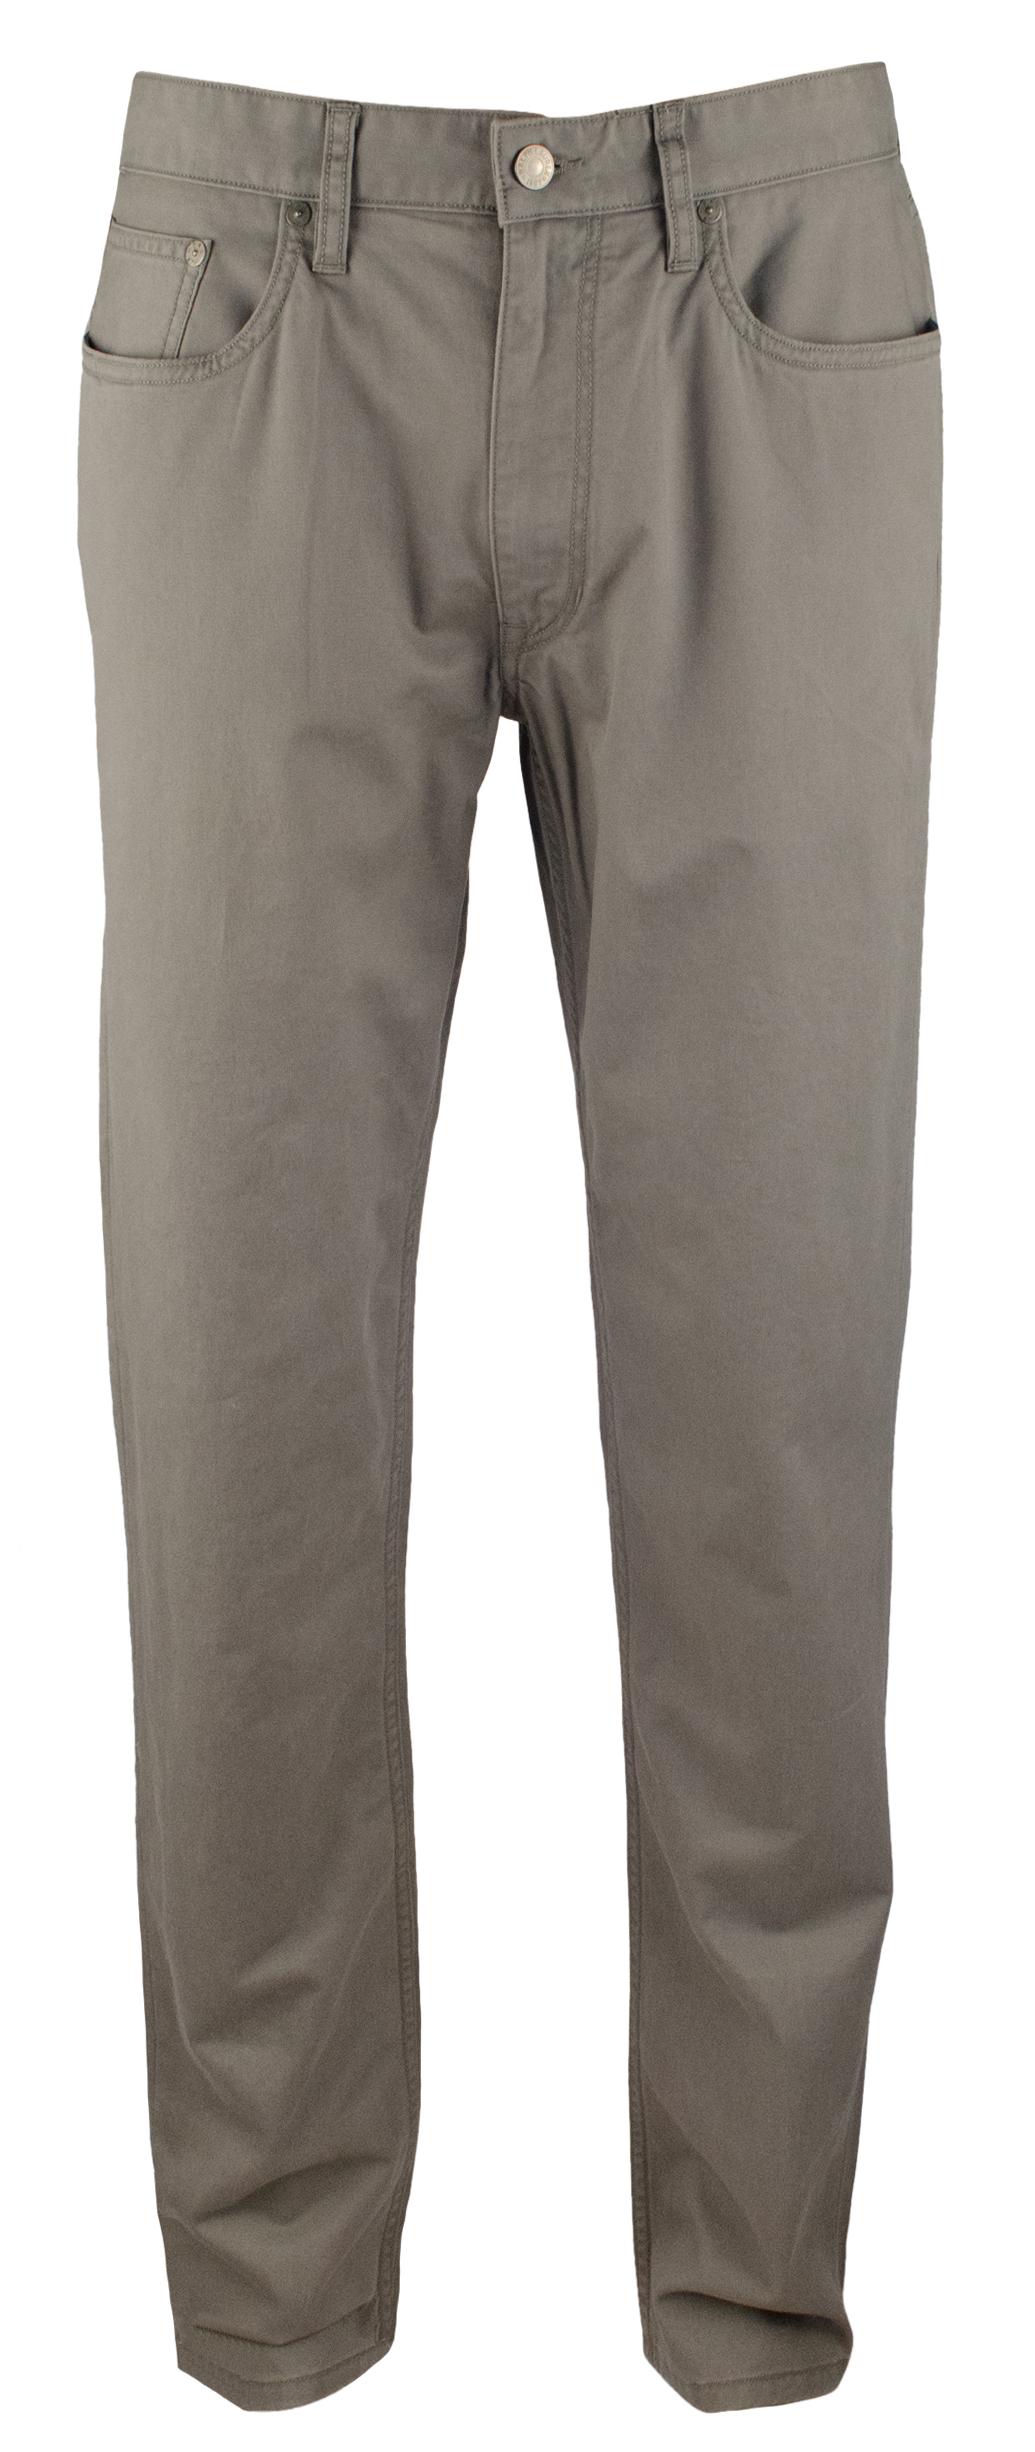 largest selection of arriving fantastic savings Details about Polo Ralph Lauren Men's Flat Front Stretch Slim Straight Fit  Pants